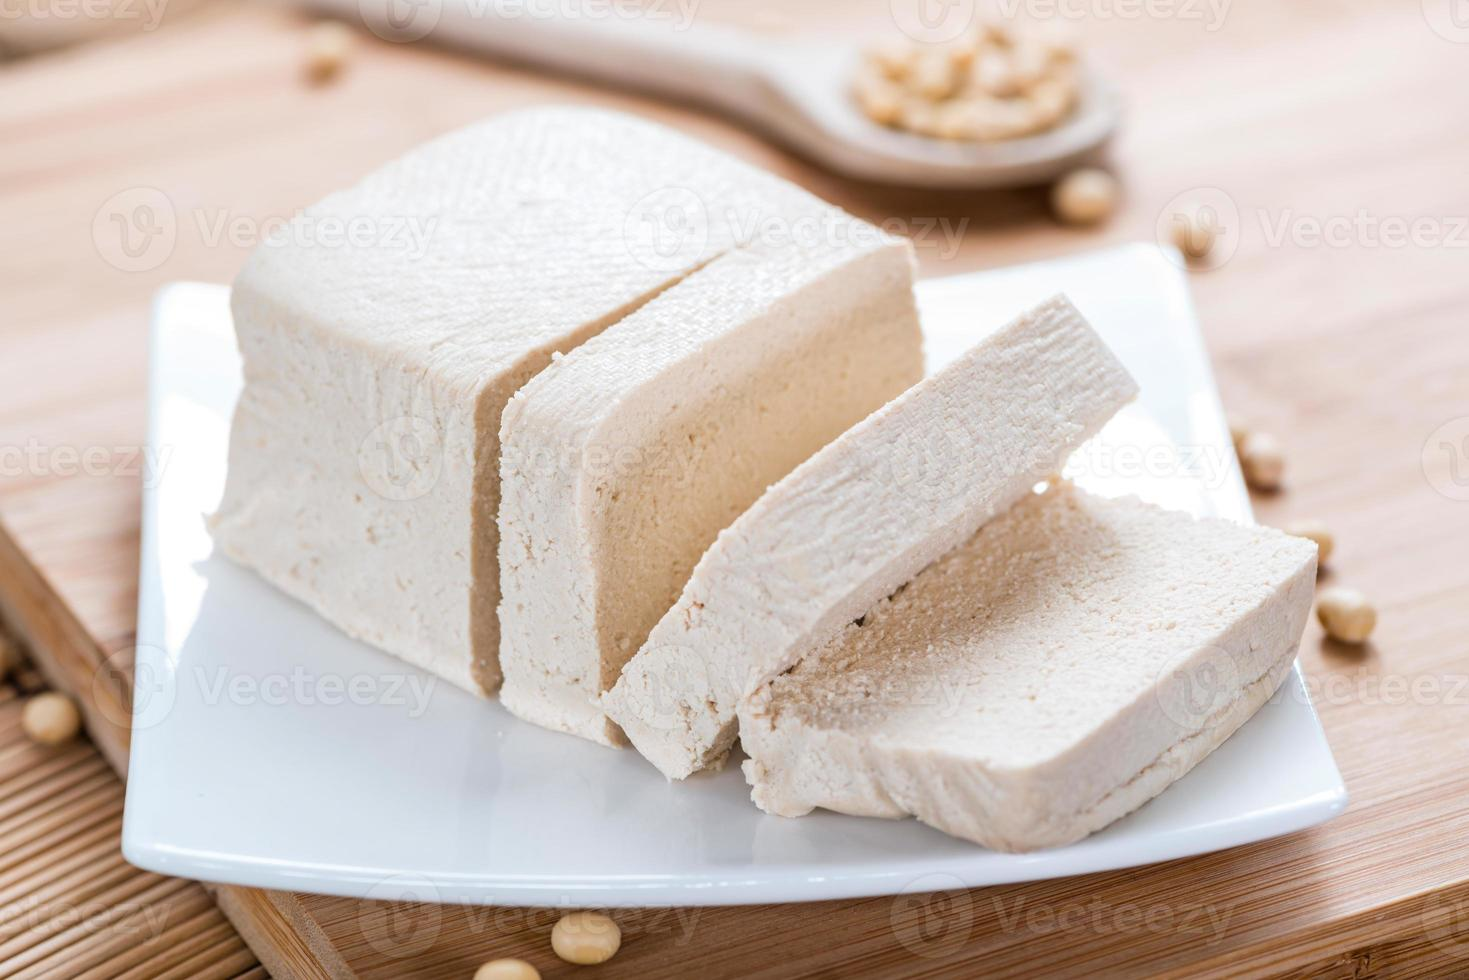 bloc de tofu photo